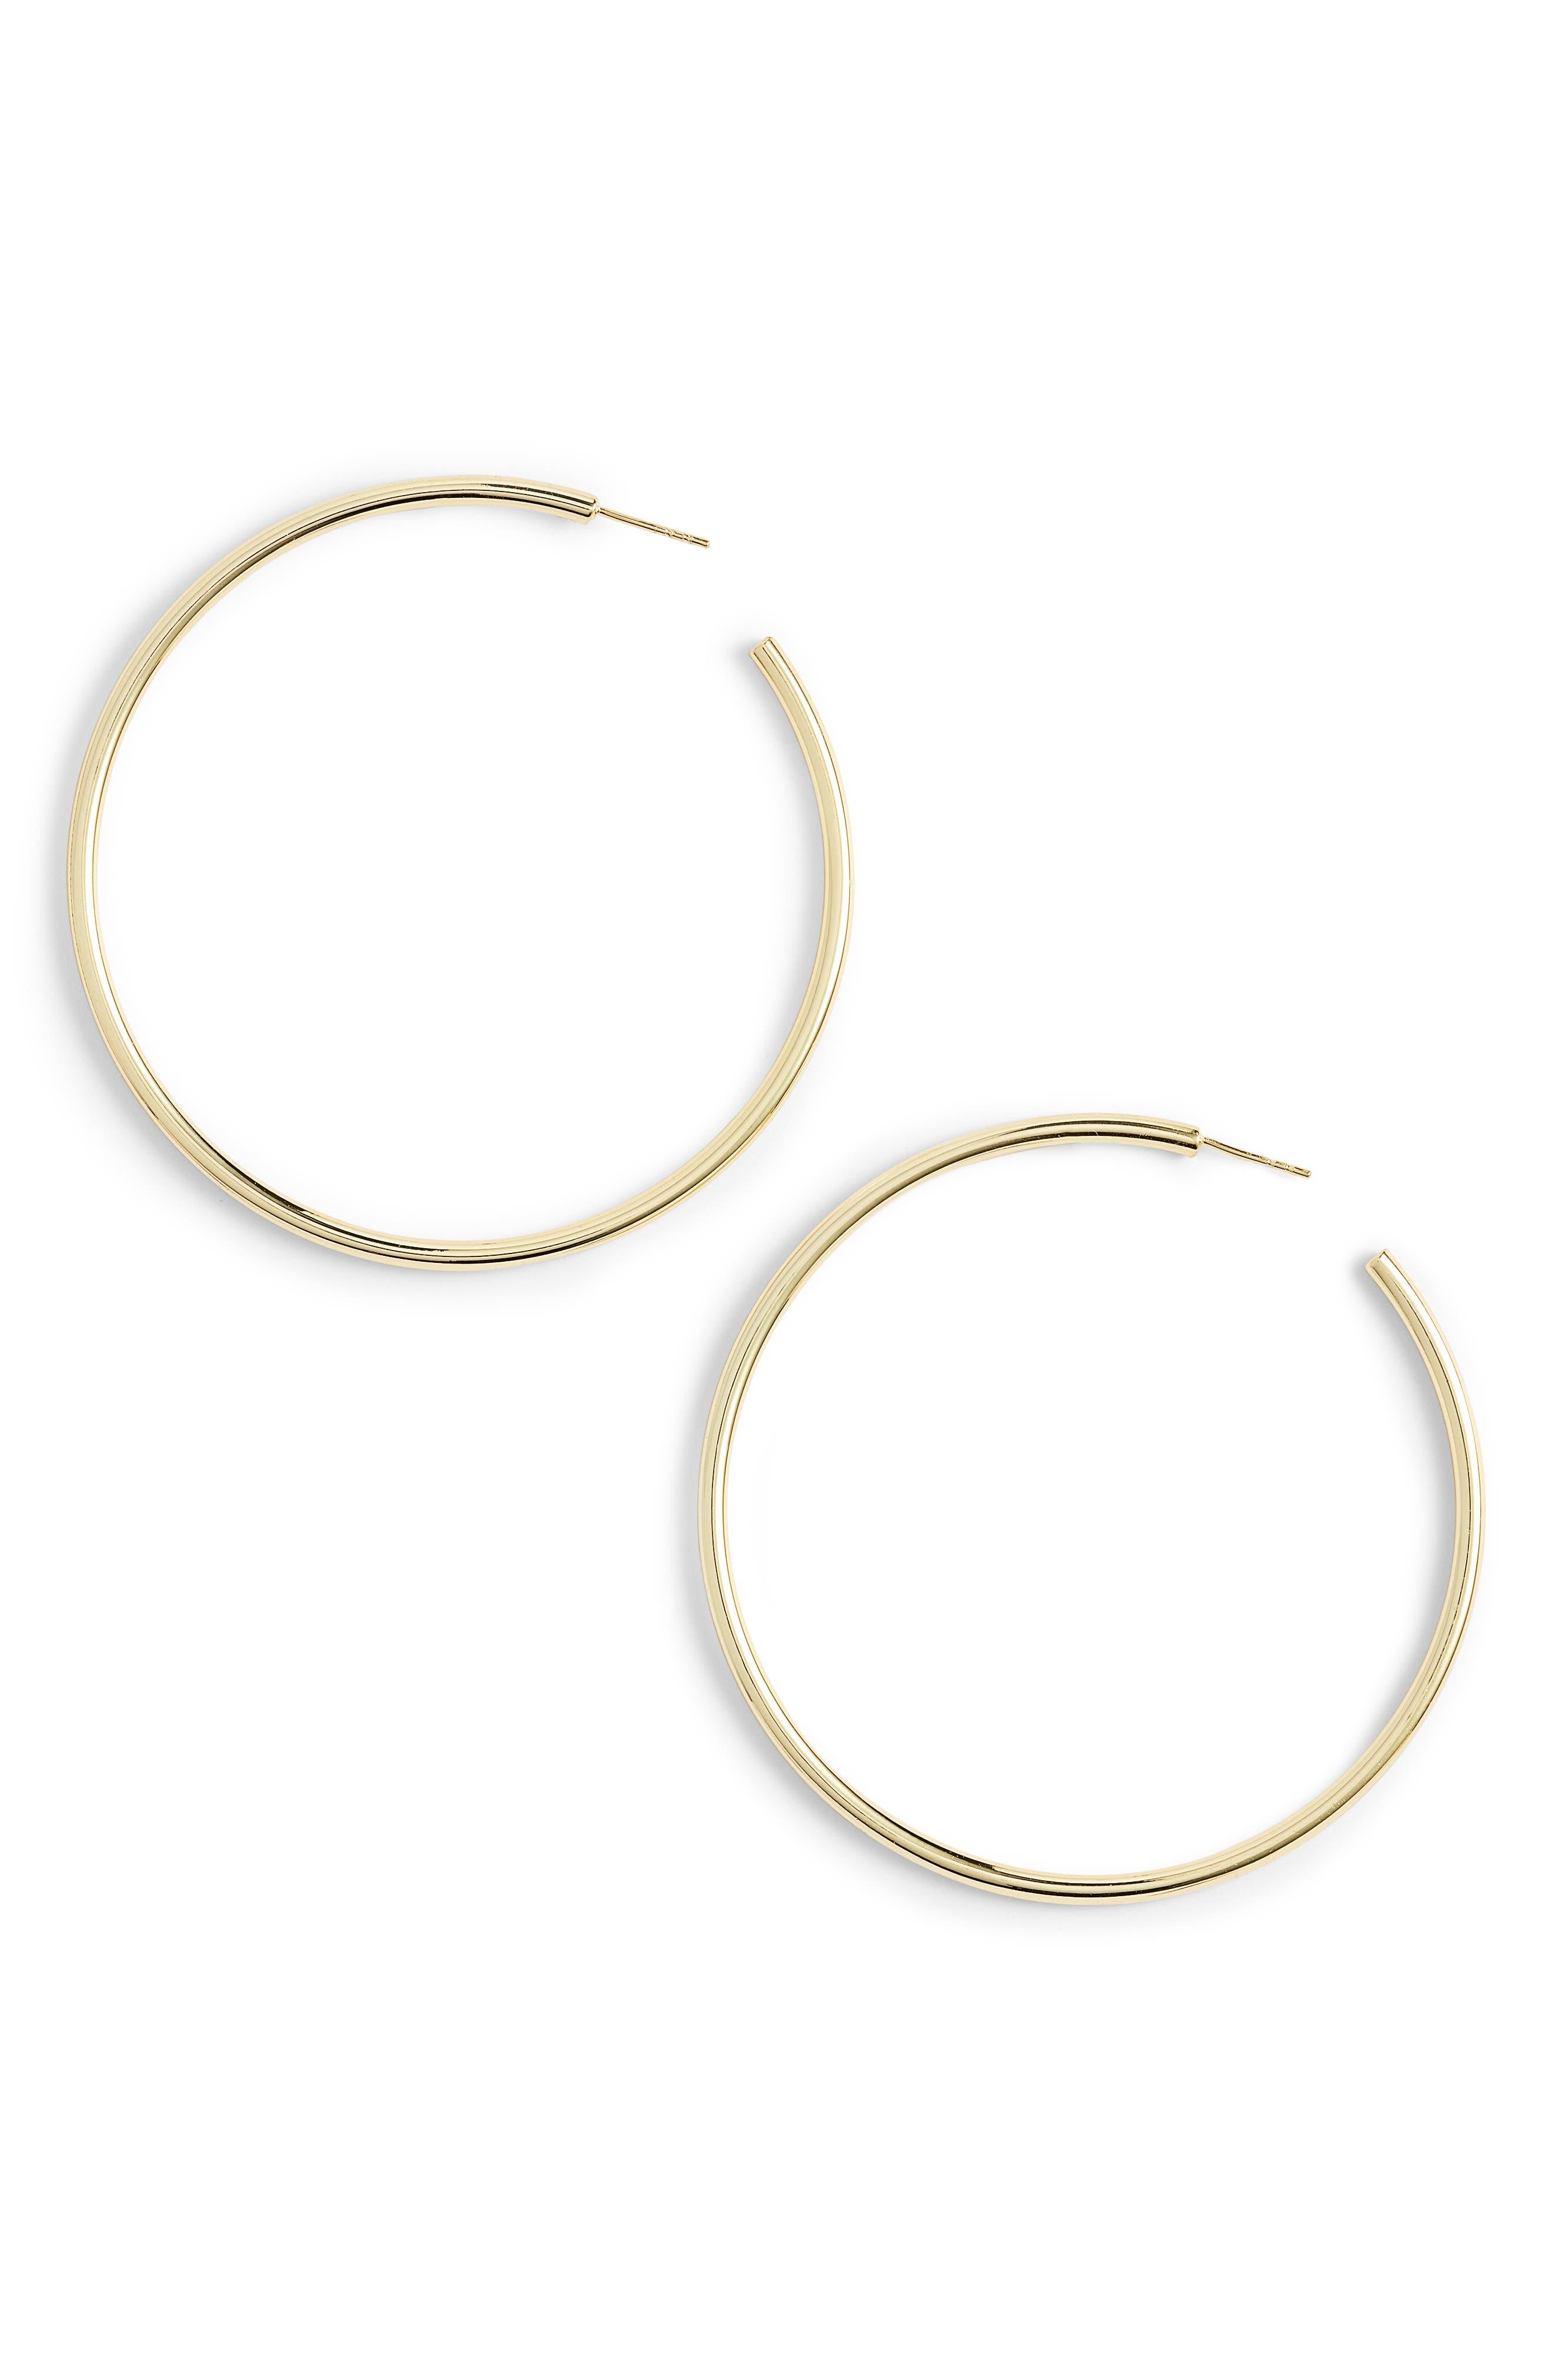 Main Image - Argento Vivo Large Hoop Earrings